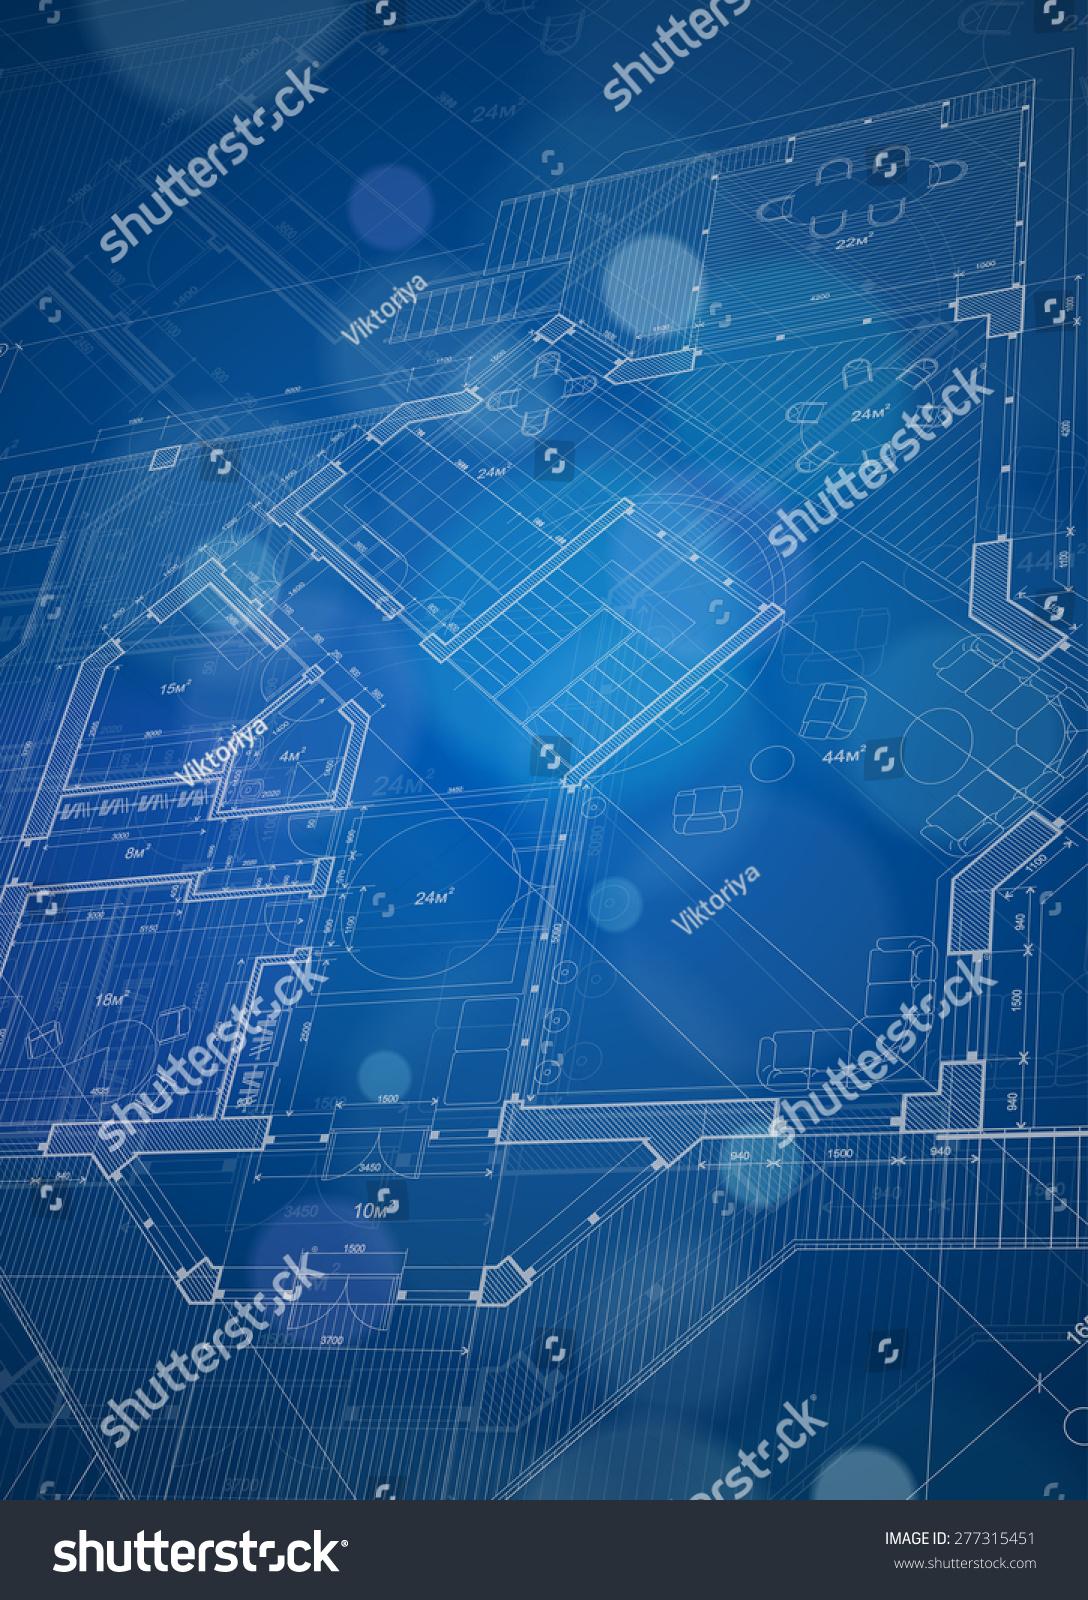 Architecture Design Blueprint House Plan Blue Technology Background